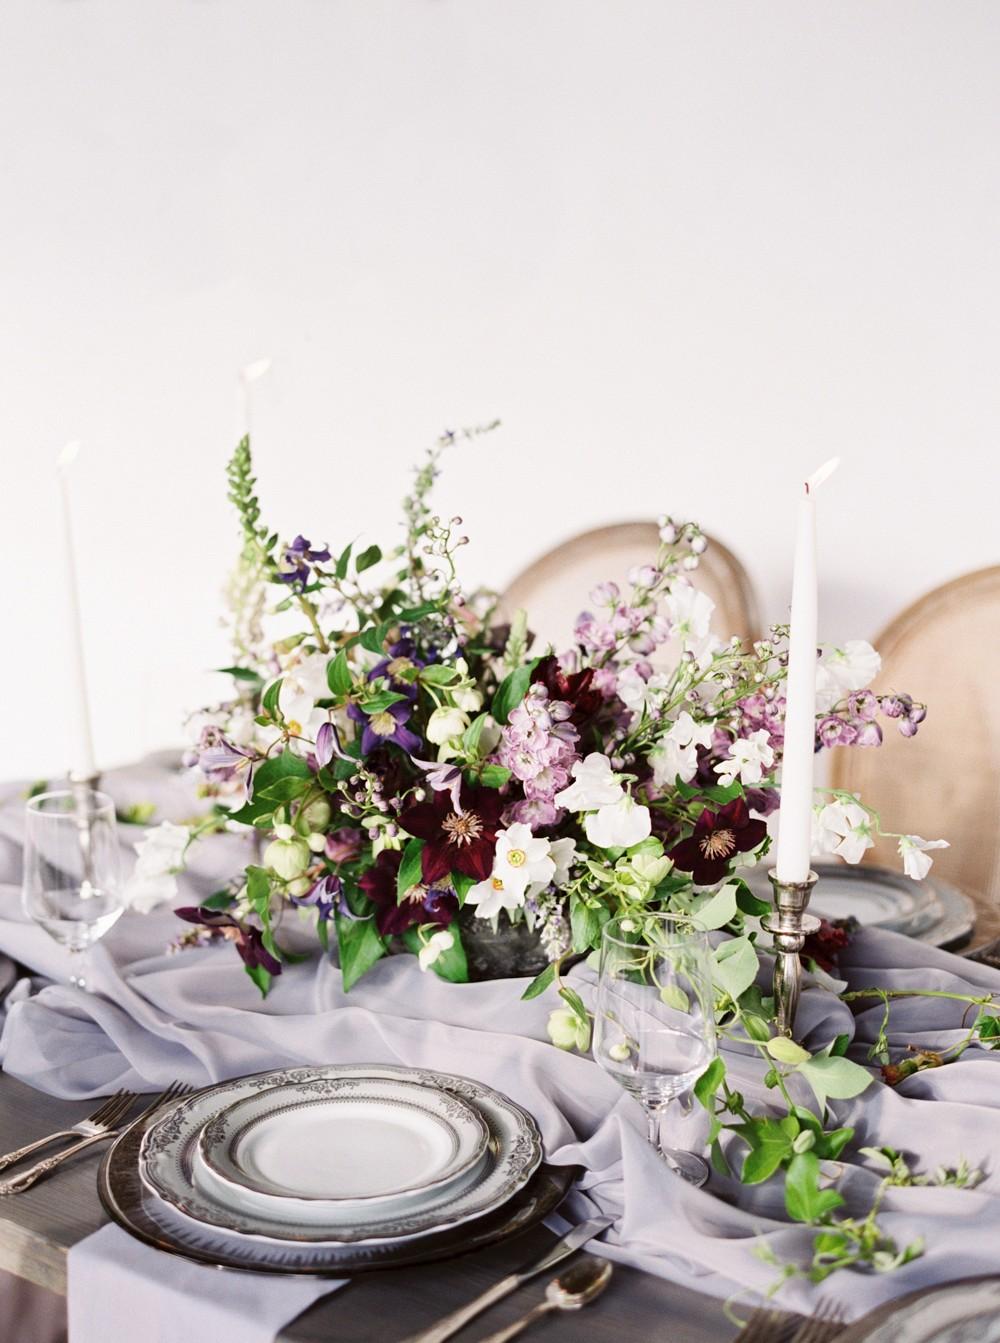 Elegant Italian Inspired Tablescape